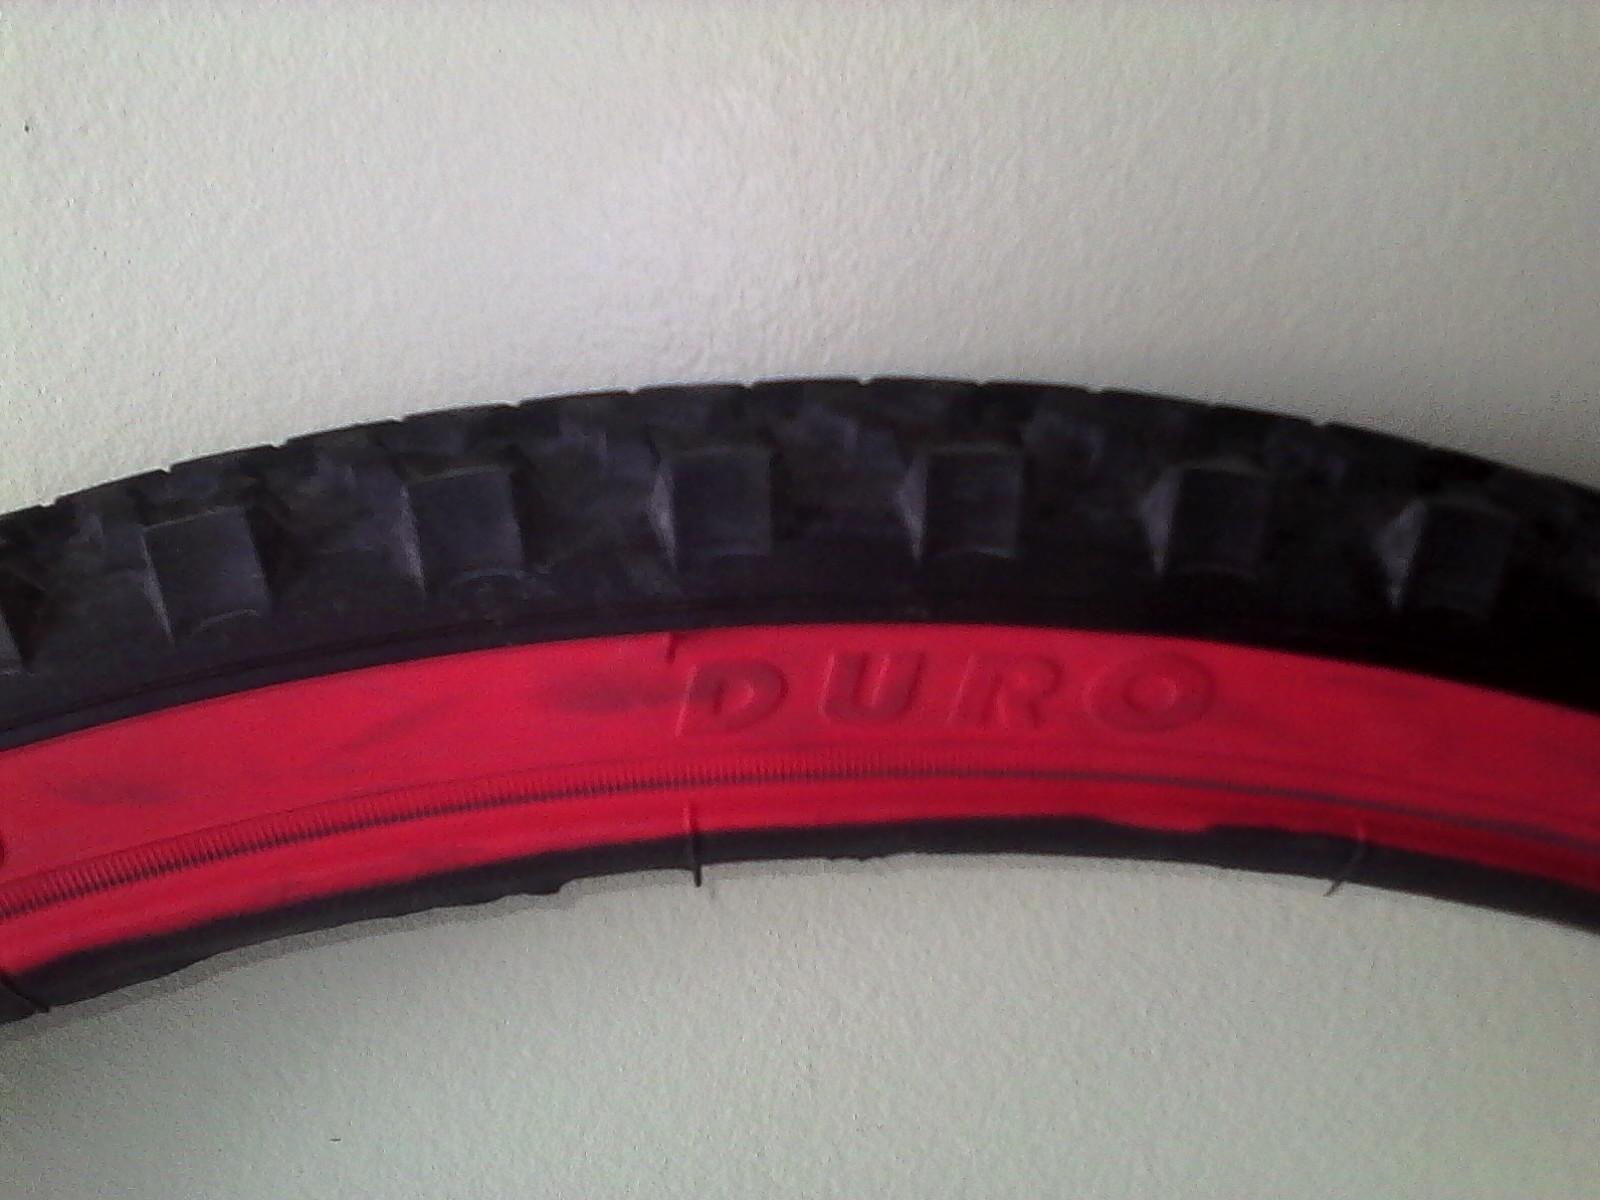 troc de troc pneus duro diamond grip image 1